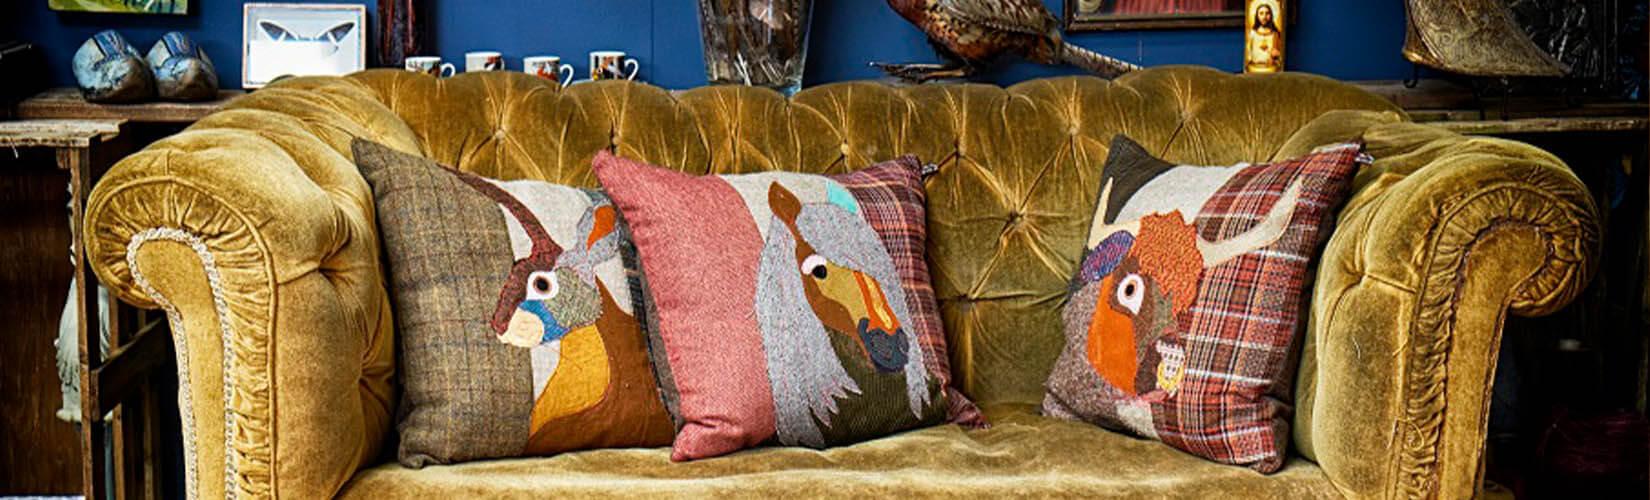 Carola Van Dyke - The Textile Taxidermy Home Decor Trendsetter: Brand Focus